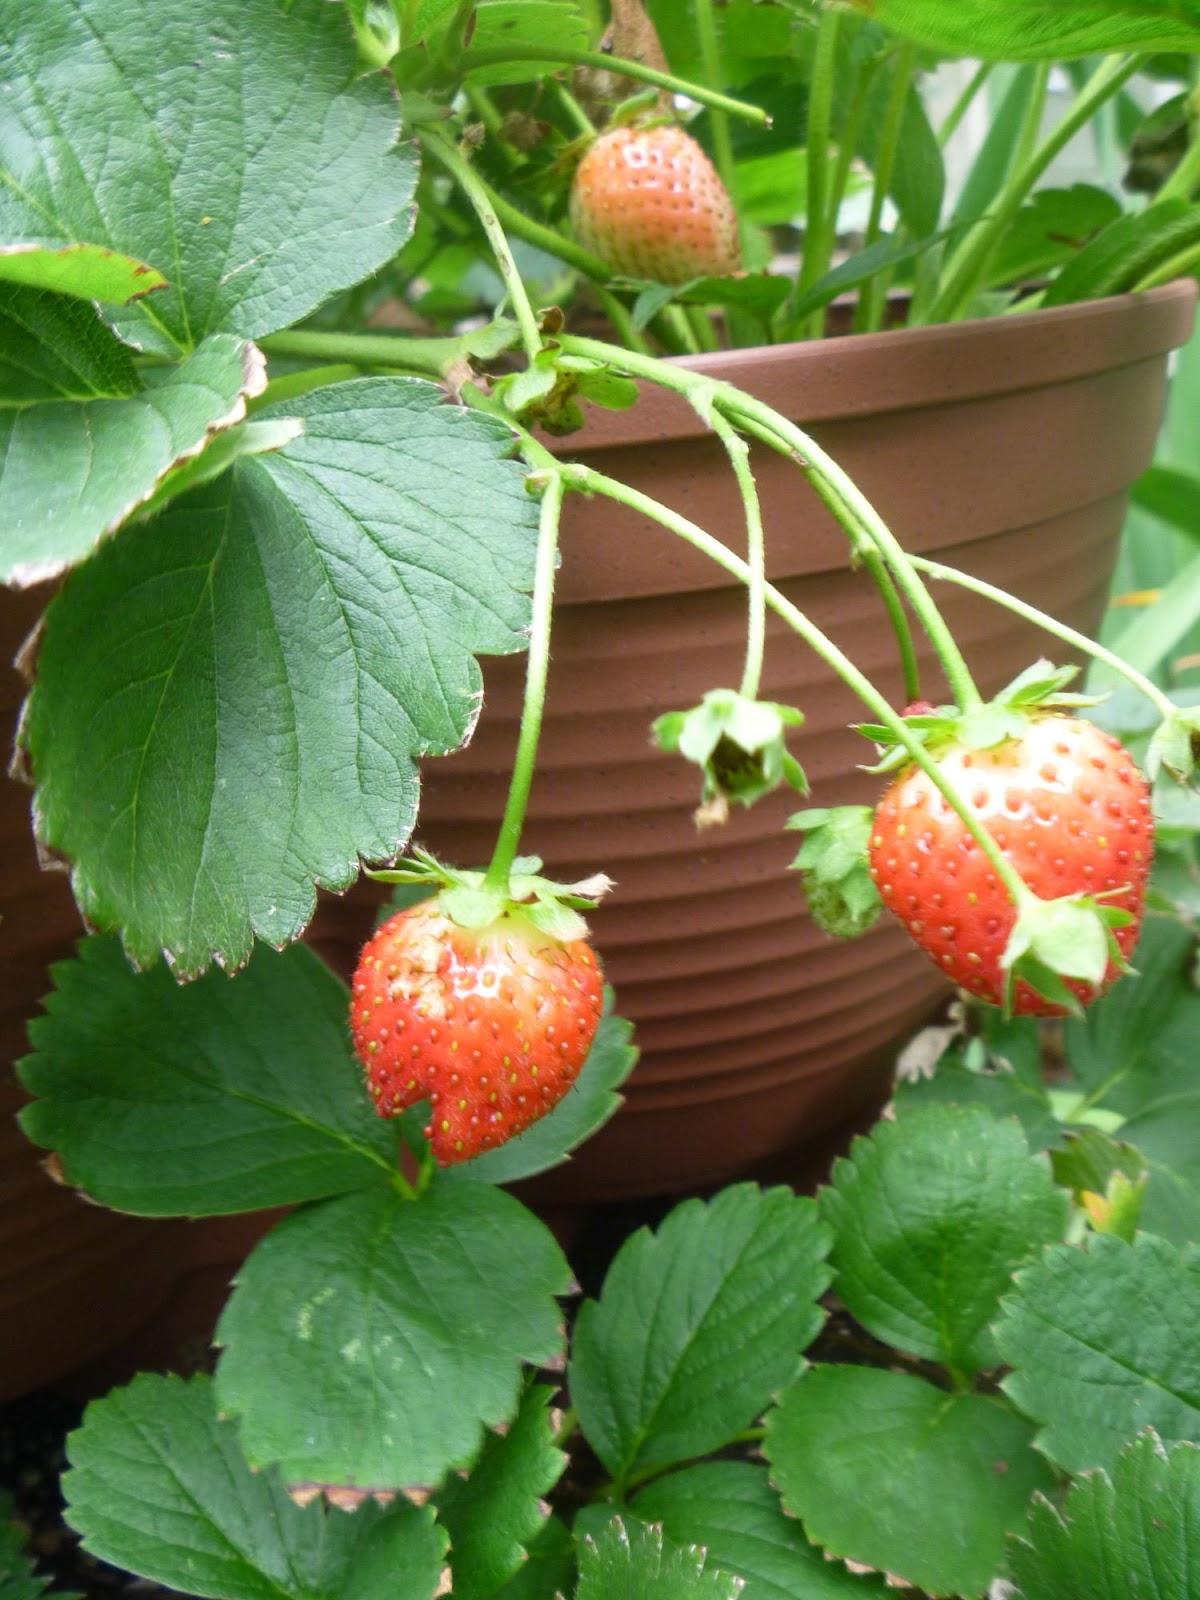 my homemade iowa life strawberry stack a pot update